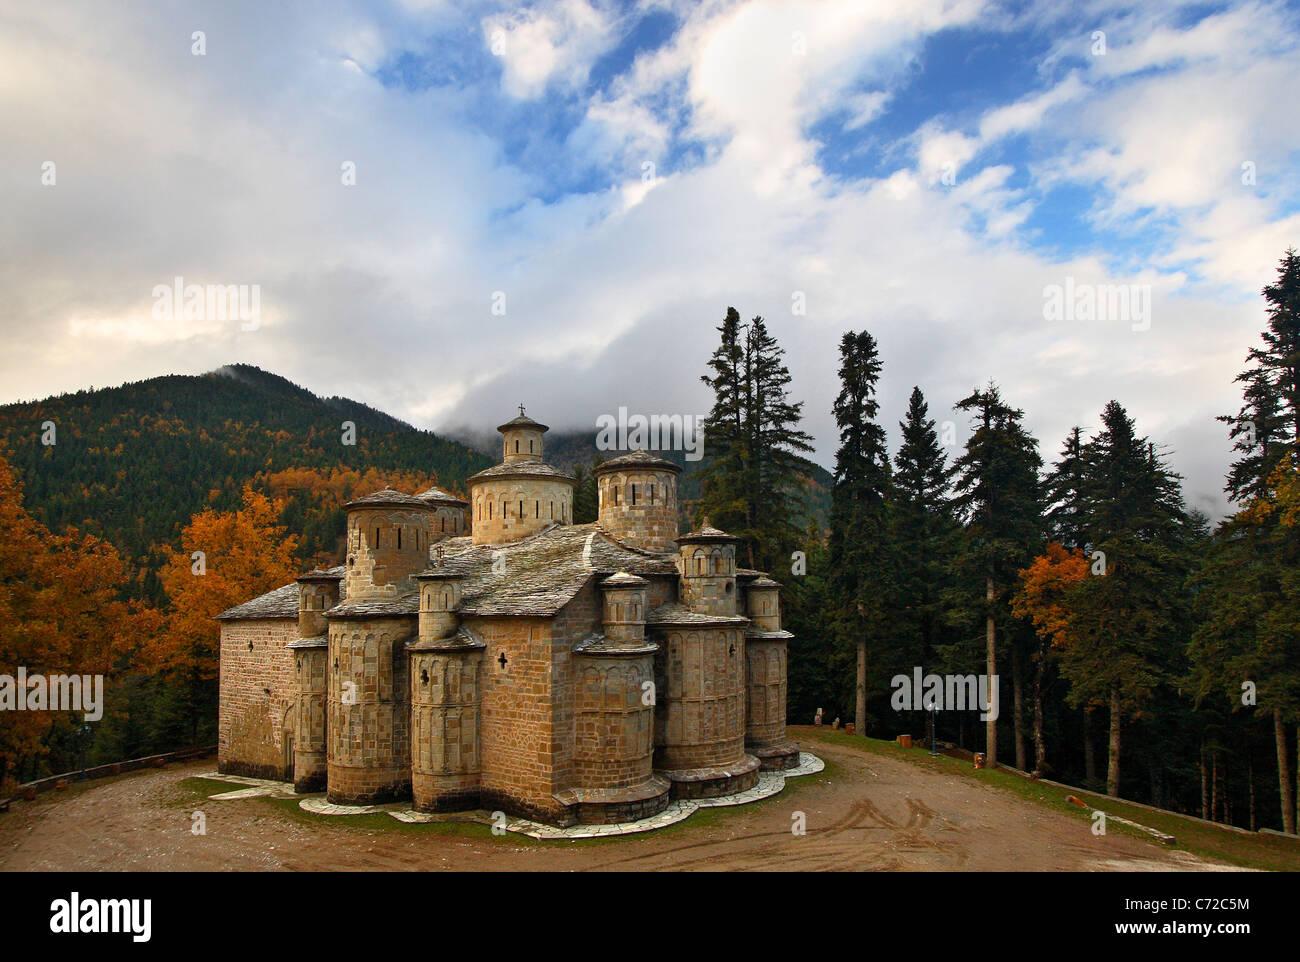 Doliana (or 'Dolianon') monastery in Aspropotamos region, Trikala Prefecture, Thessaly, Greece - Stock Image